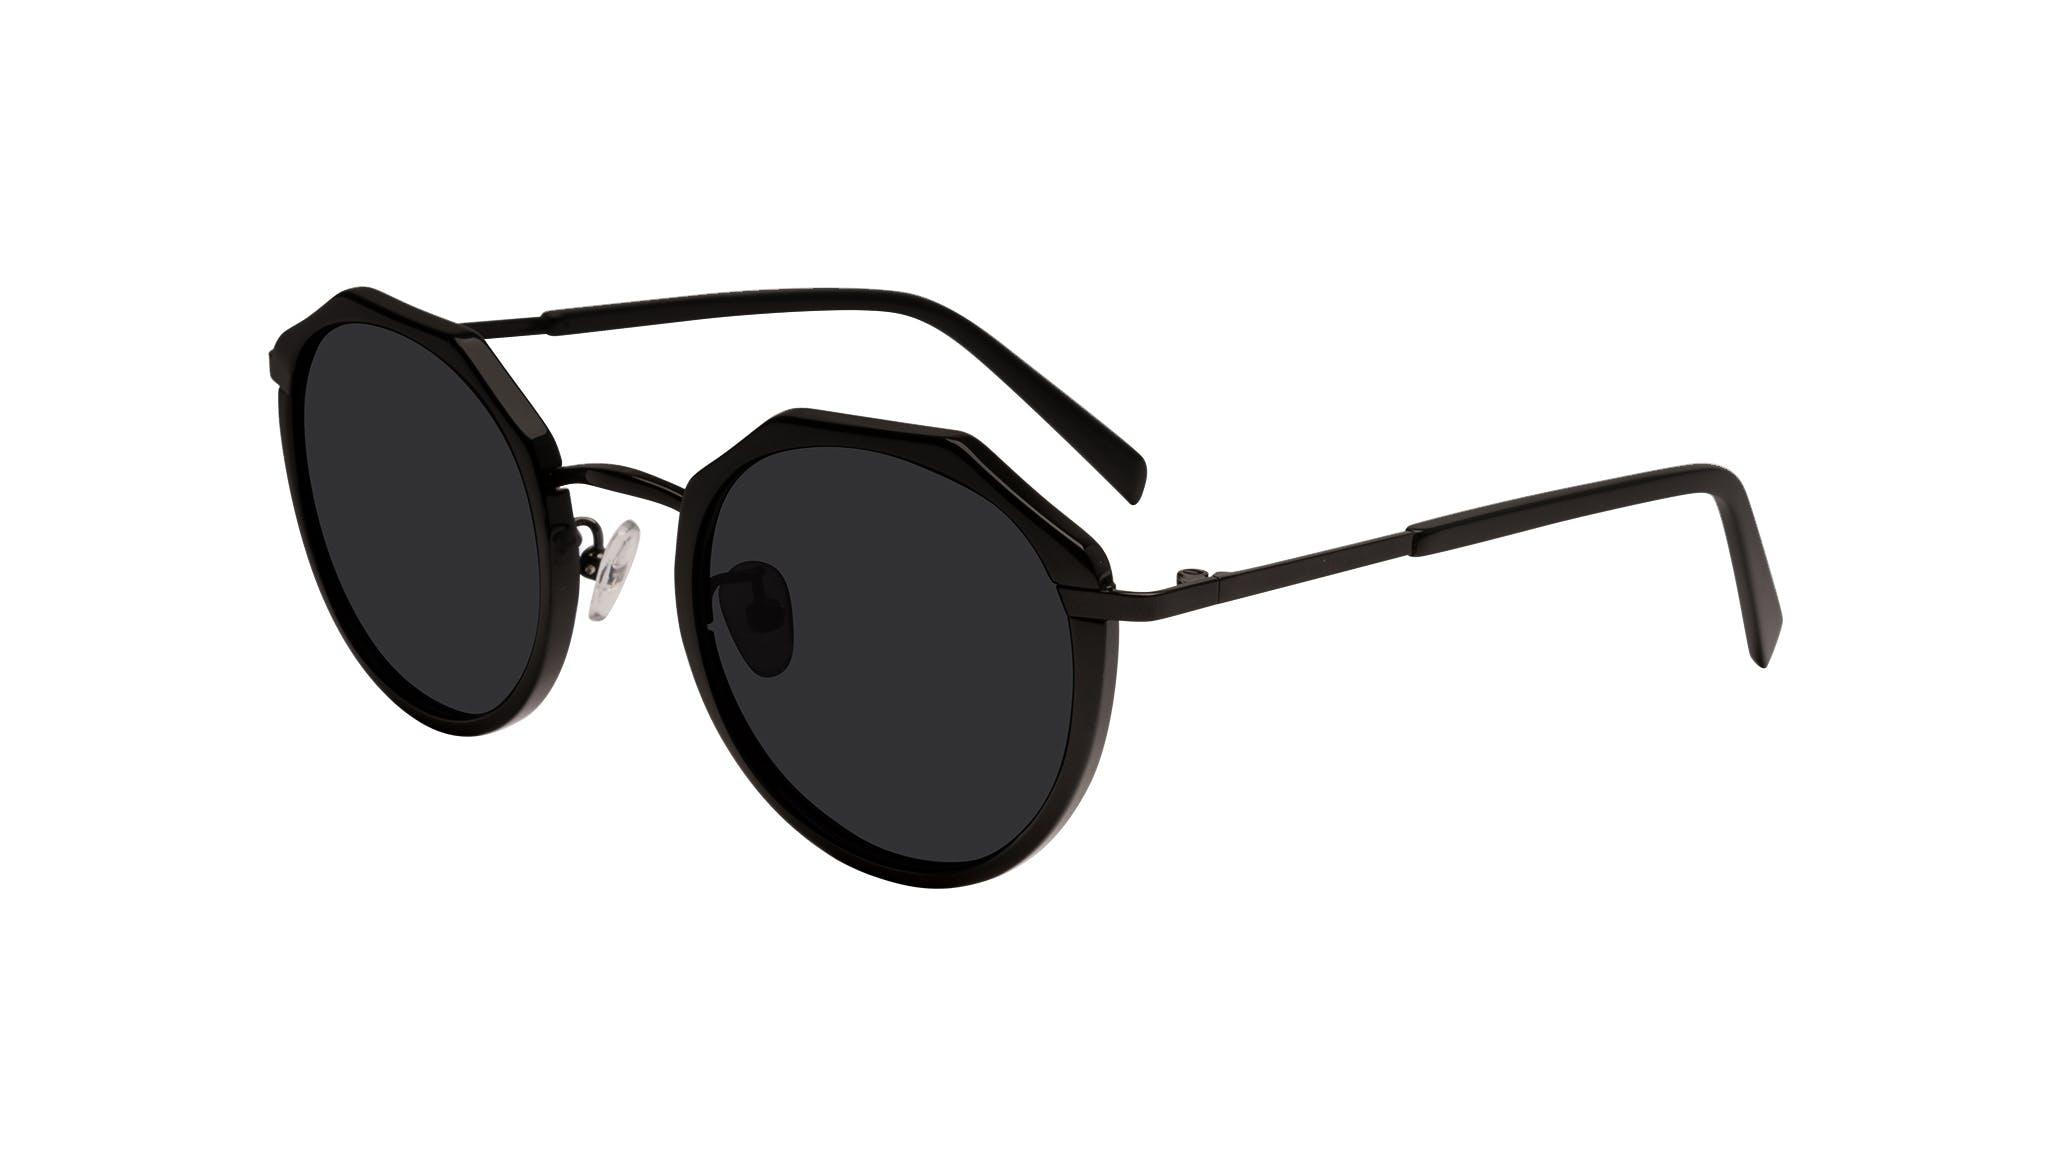 Affordable Fashion Glasses Round Sunglasses Women Womance Matte Tilt